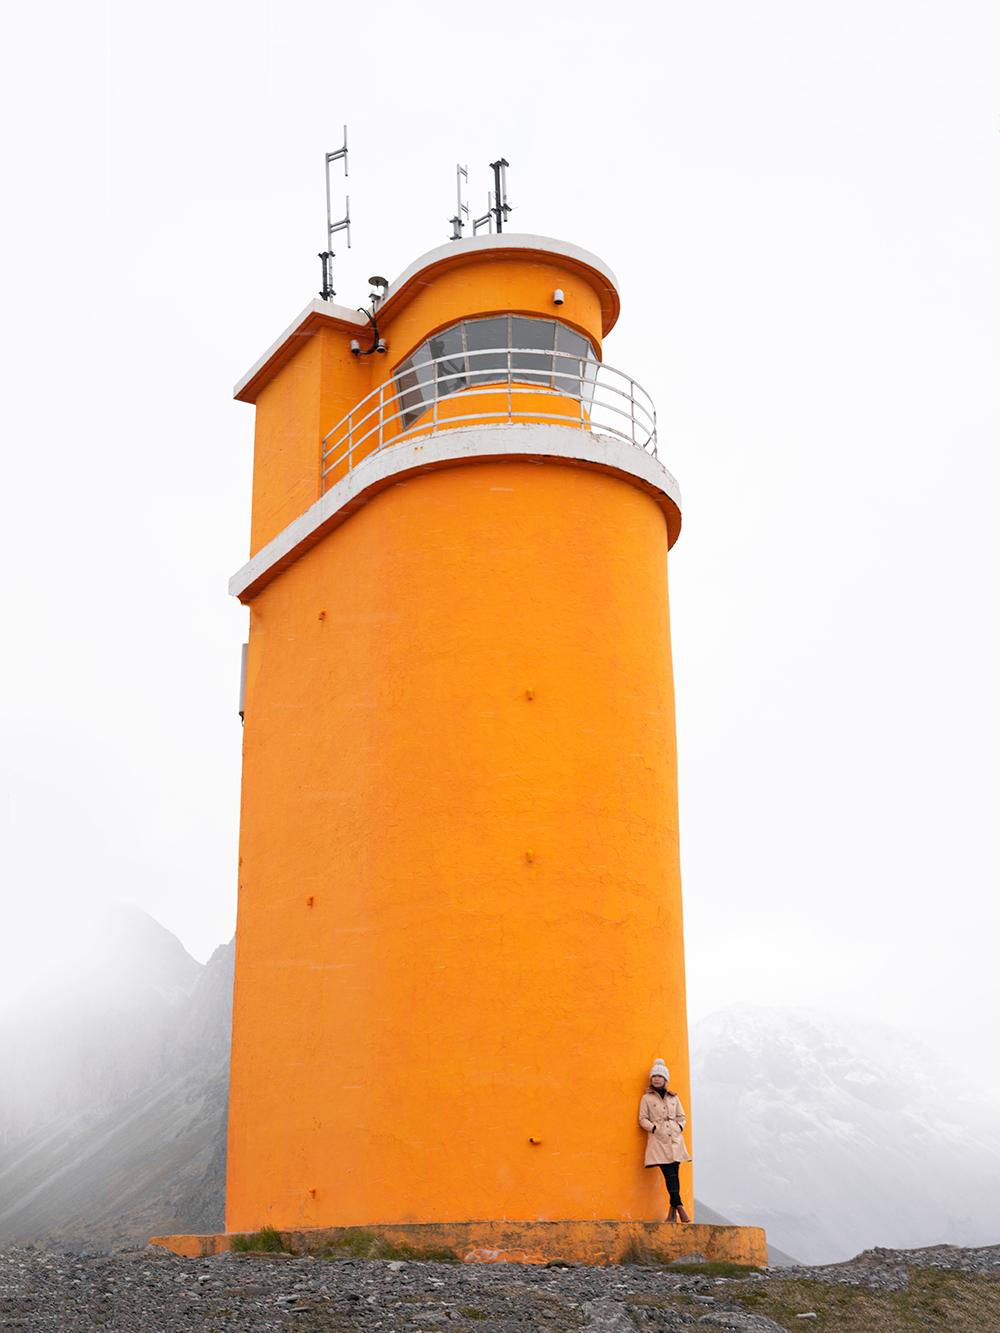 04iceland-hvalnes-lighthouse-travel-landscape-photography